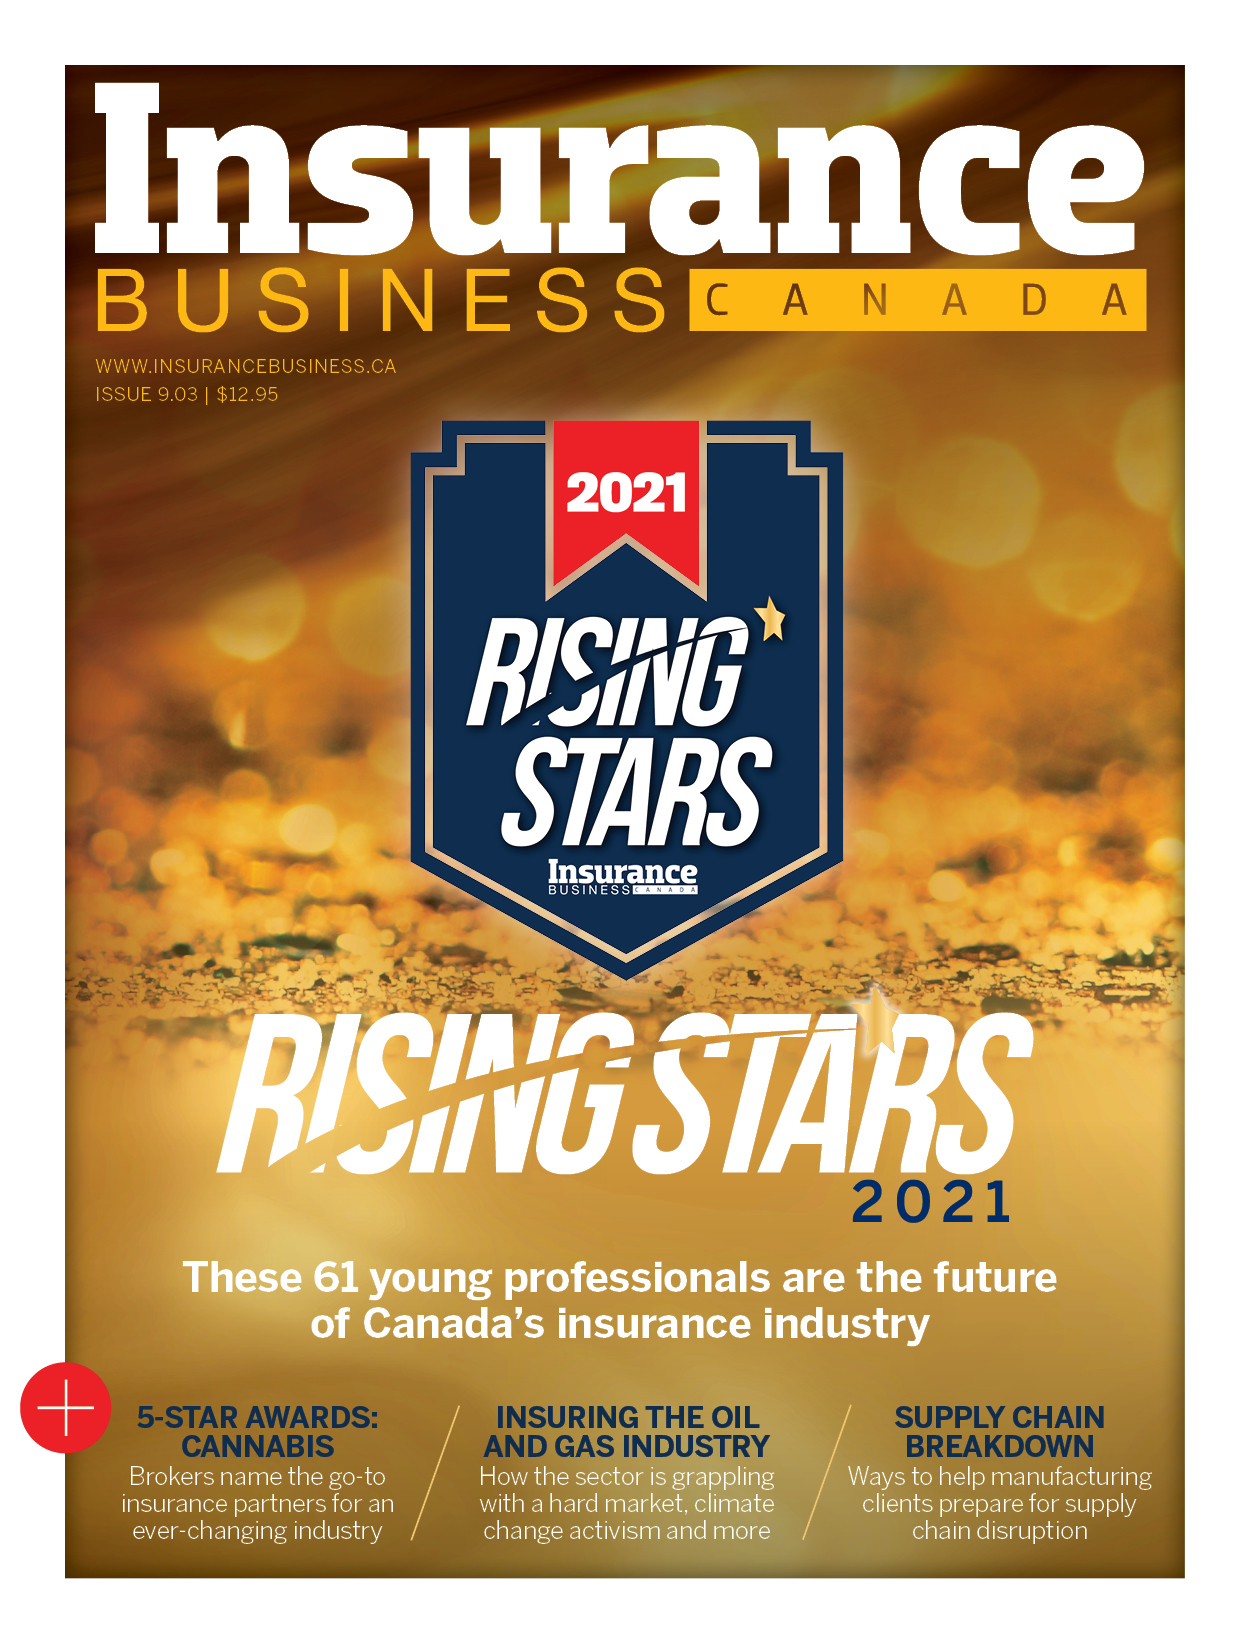 Insurance Business Magazine 9.03